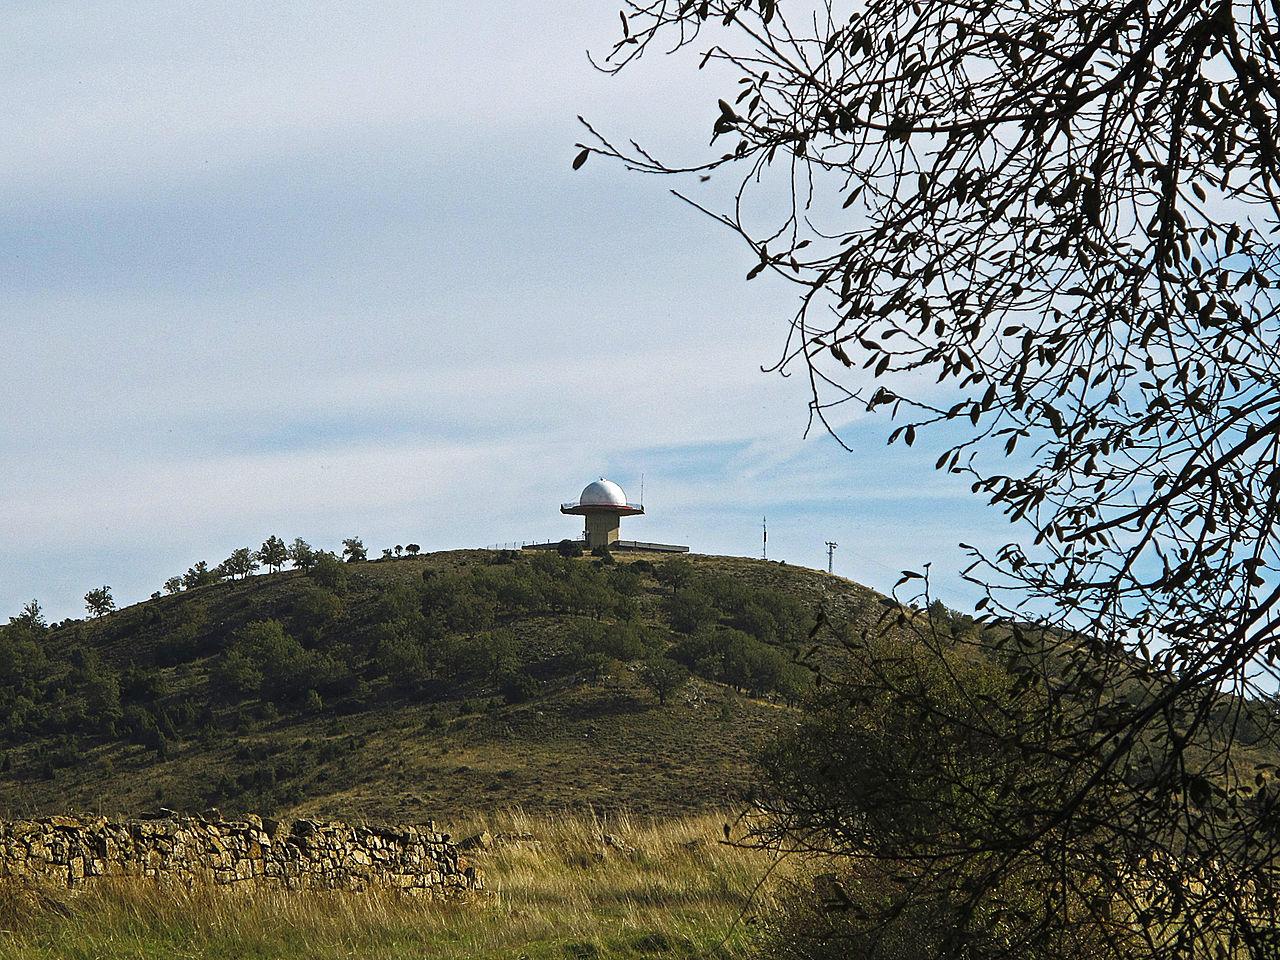 File Radar De Aena Alcolea Del Pinar Jpg Wikimedia Commons